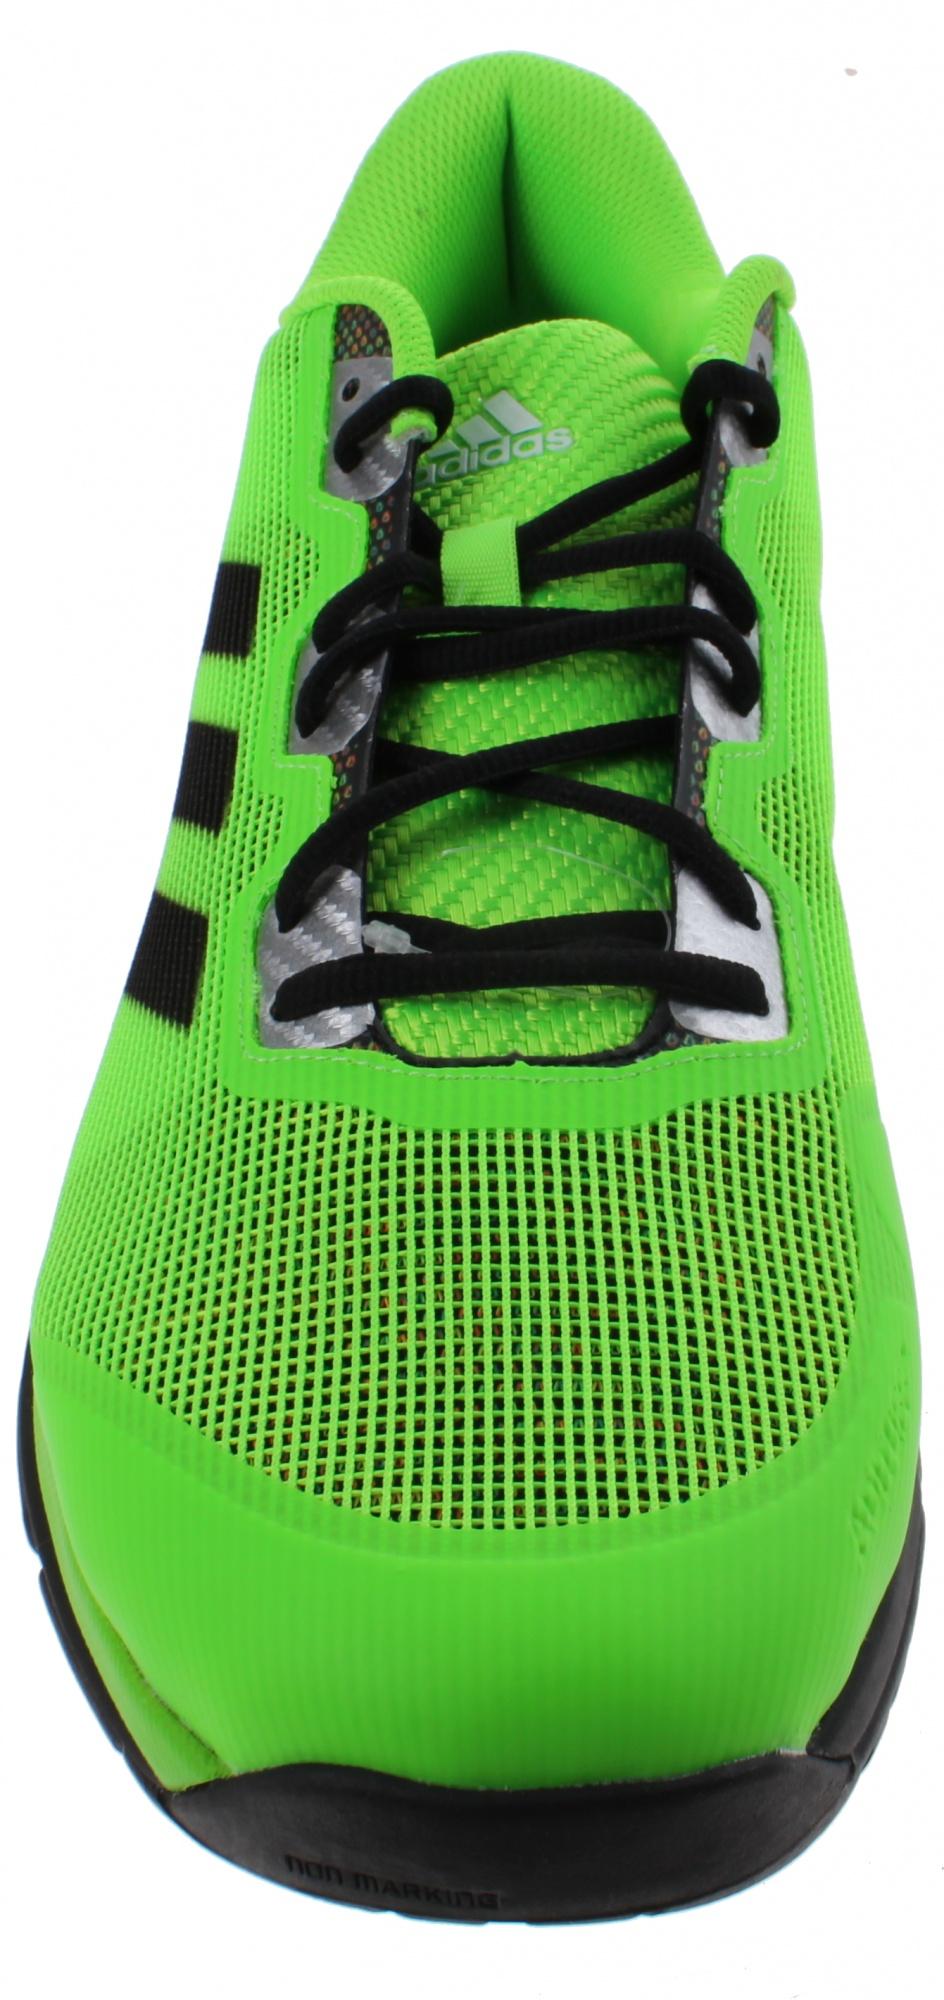 running II shoes Boost men Sport Stabil Internet adidas amp;Casuals green gwCxqdCP